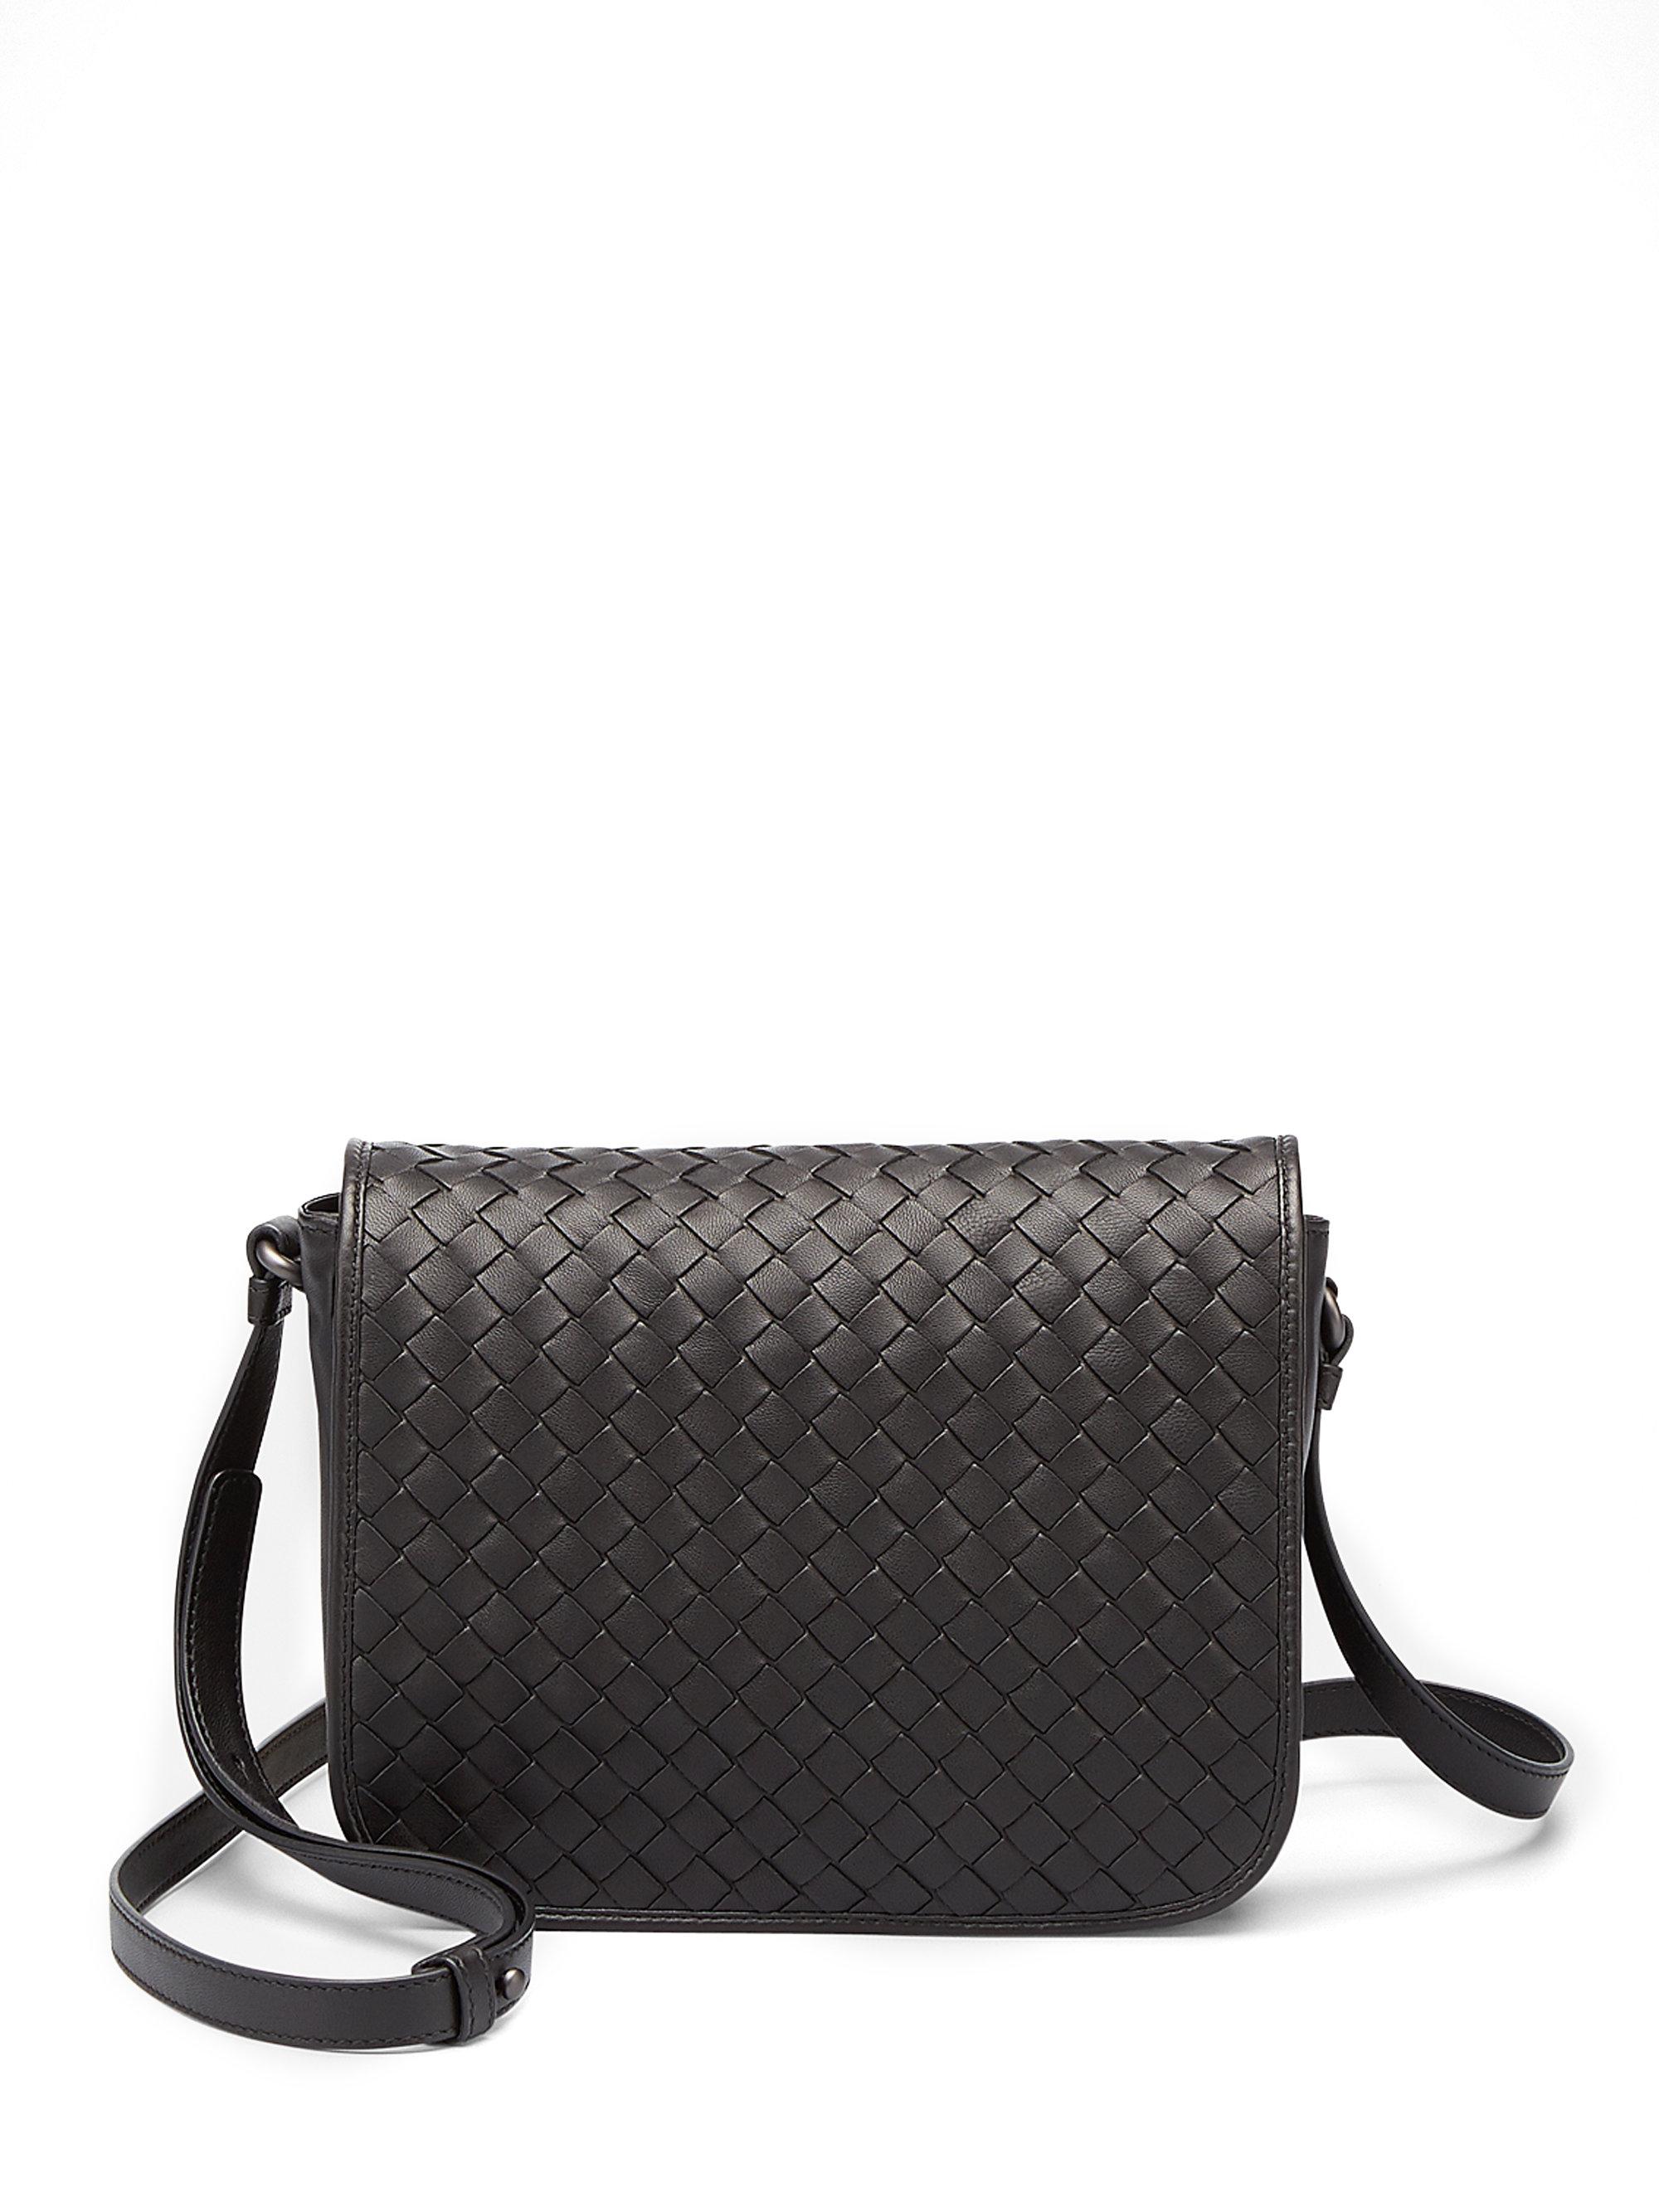 15571b772dc2c Lyst - Bottega Veneta Small Woven Flap Shoulder Bag in Black